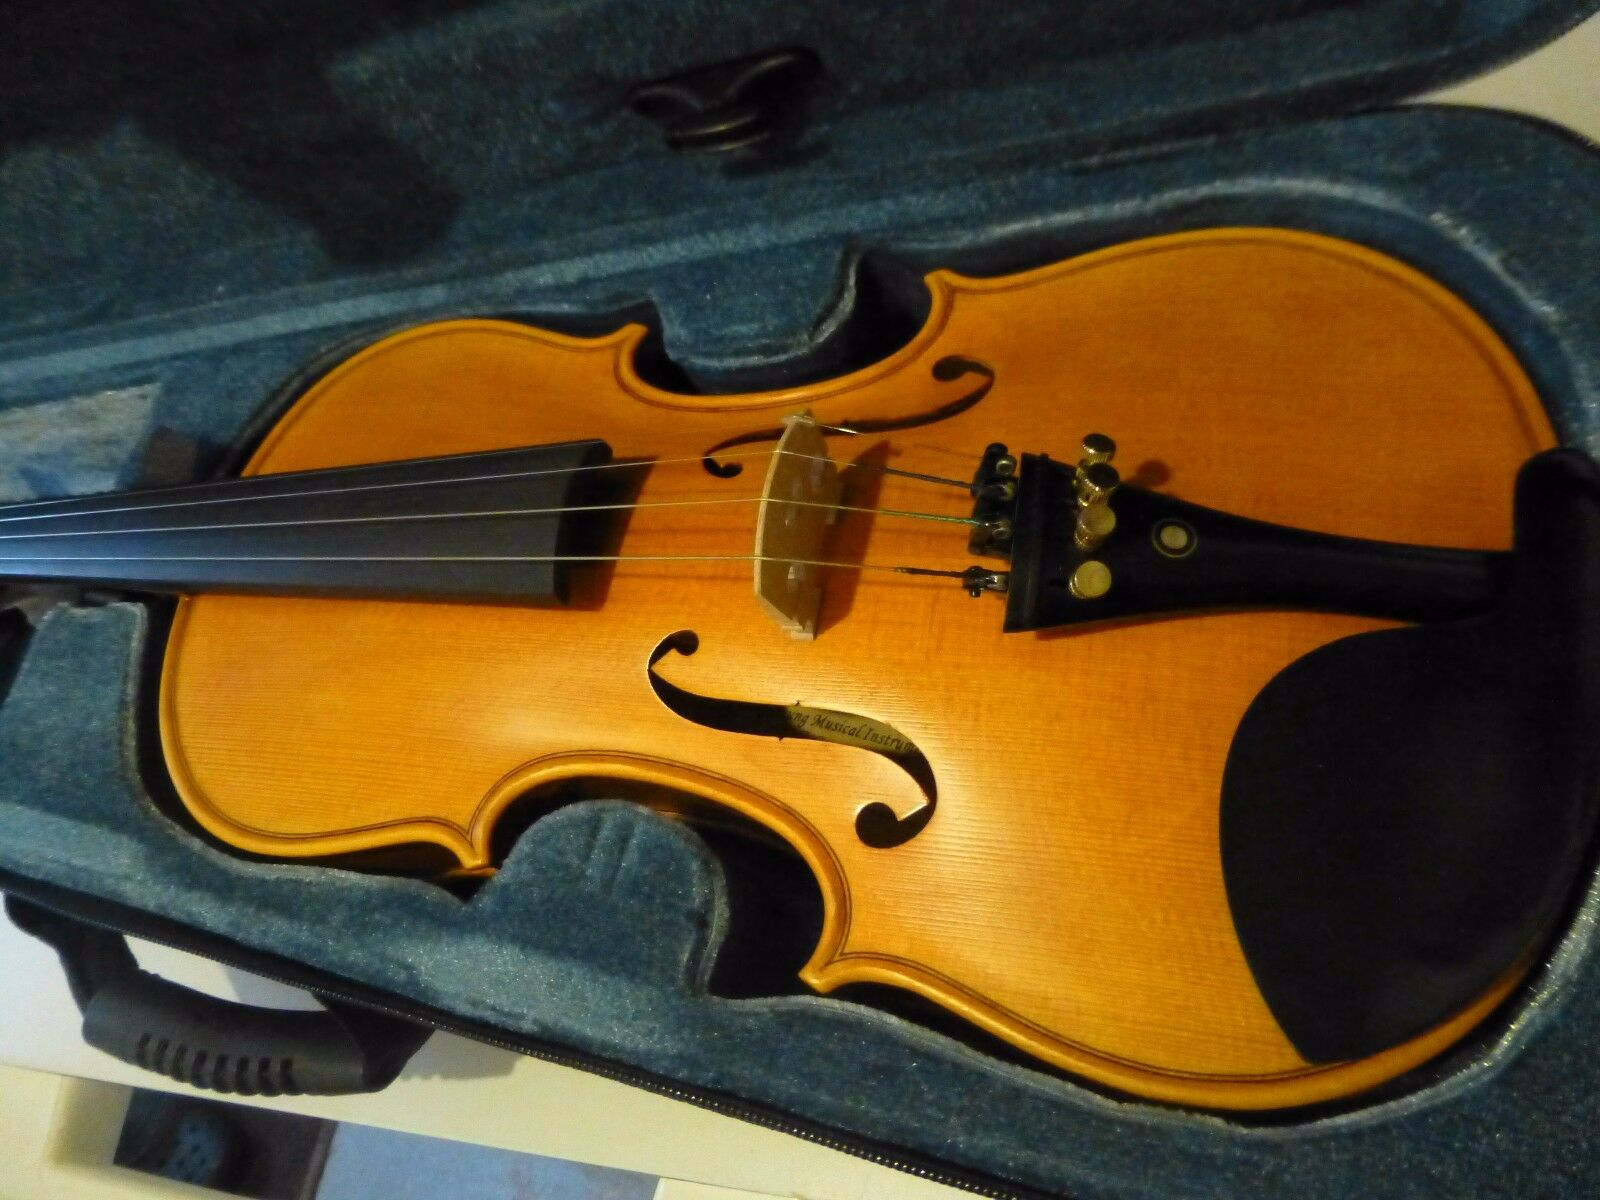 Neu Handgefertigt Violine,Stradivarius Kopie, Ebenholz Zubehör, Versandt aus UK